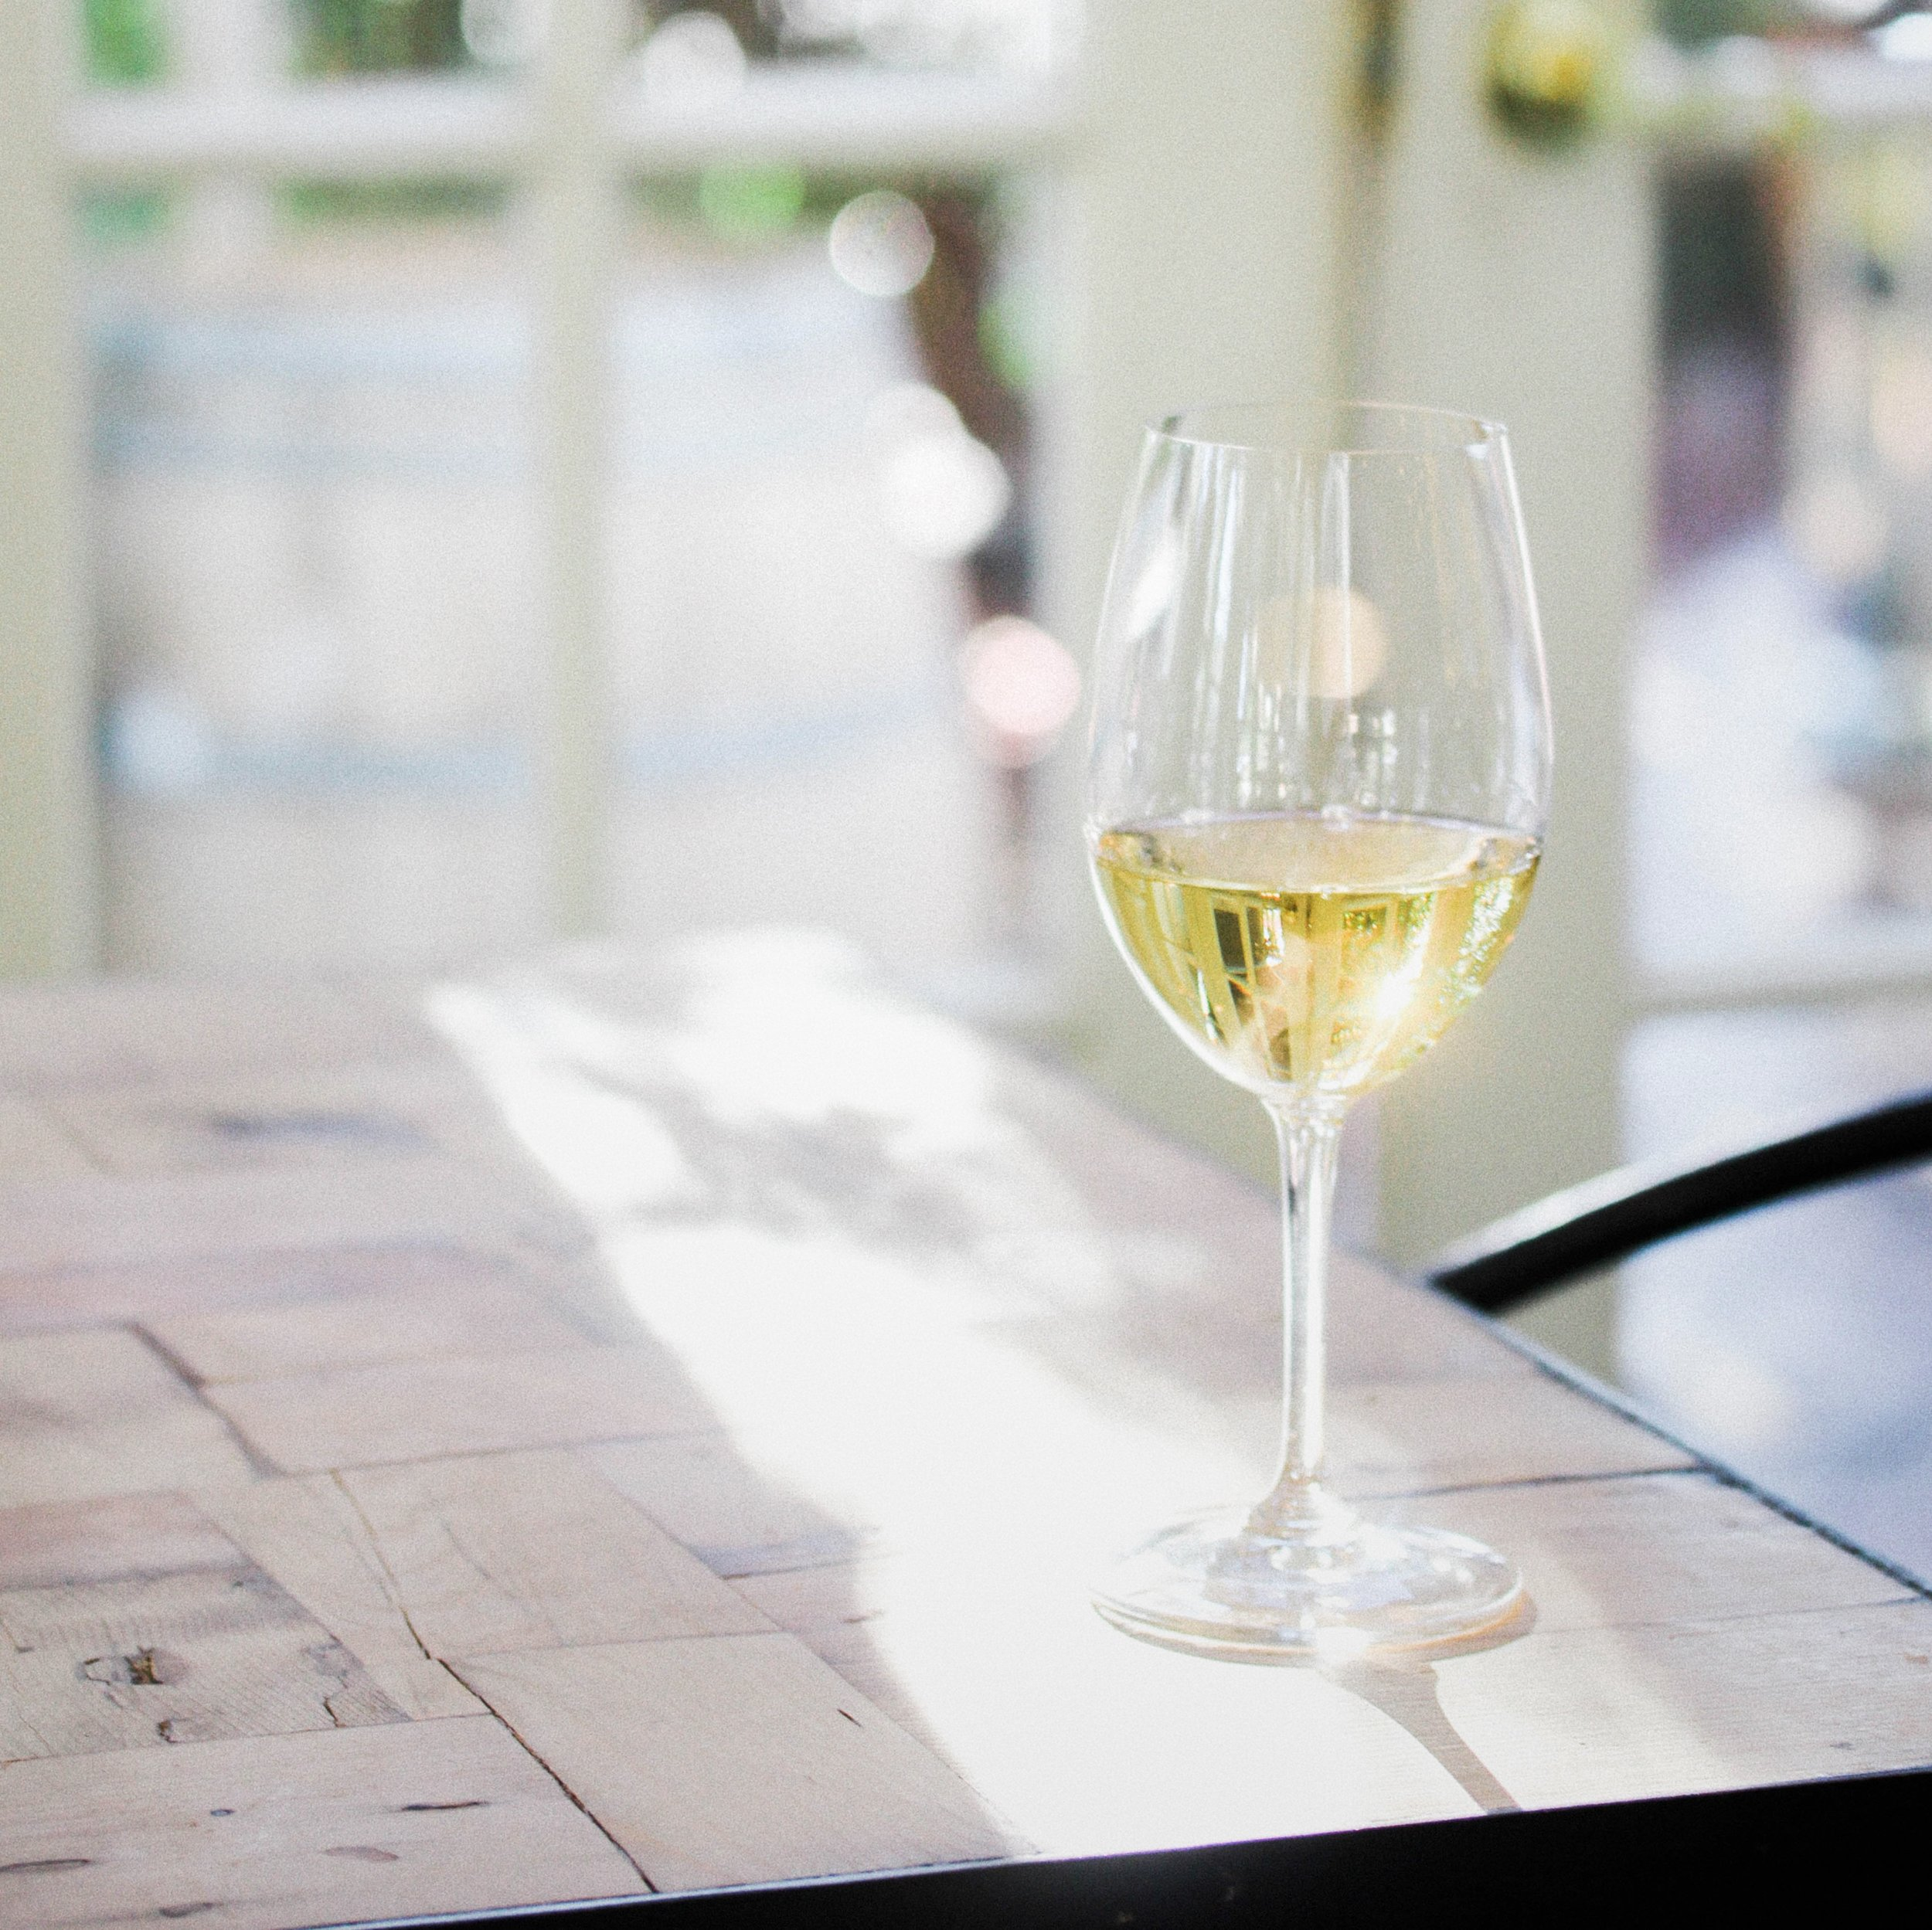 Bar Pesce Wine.JPG